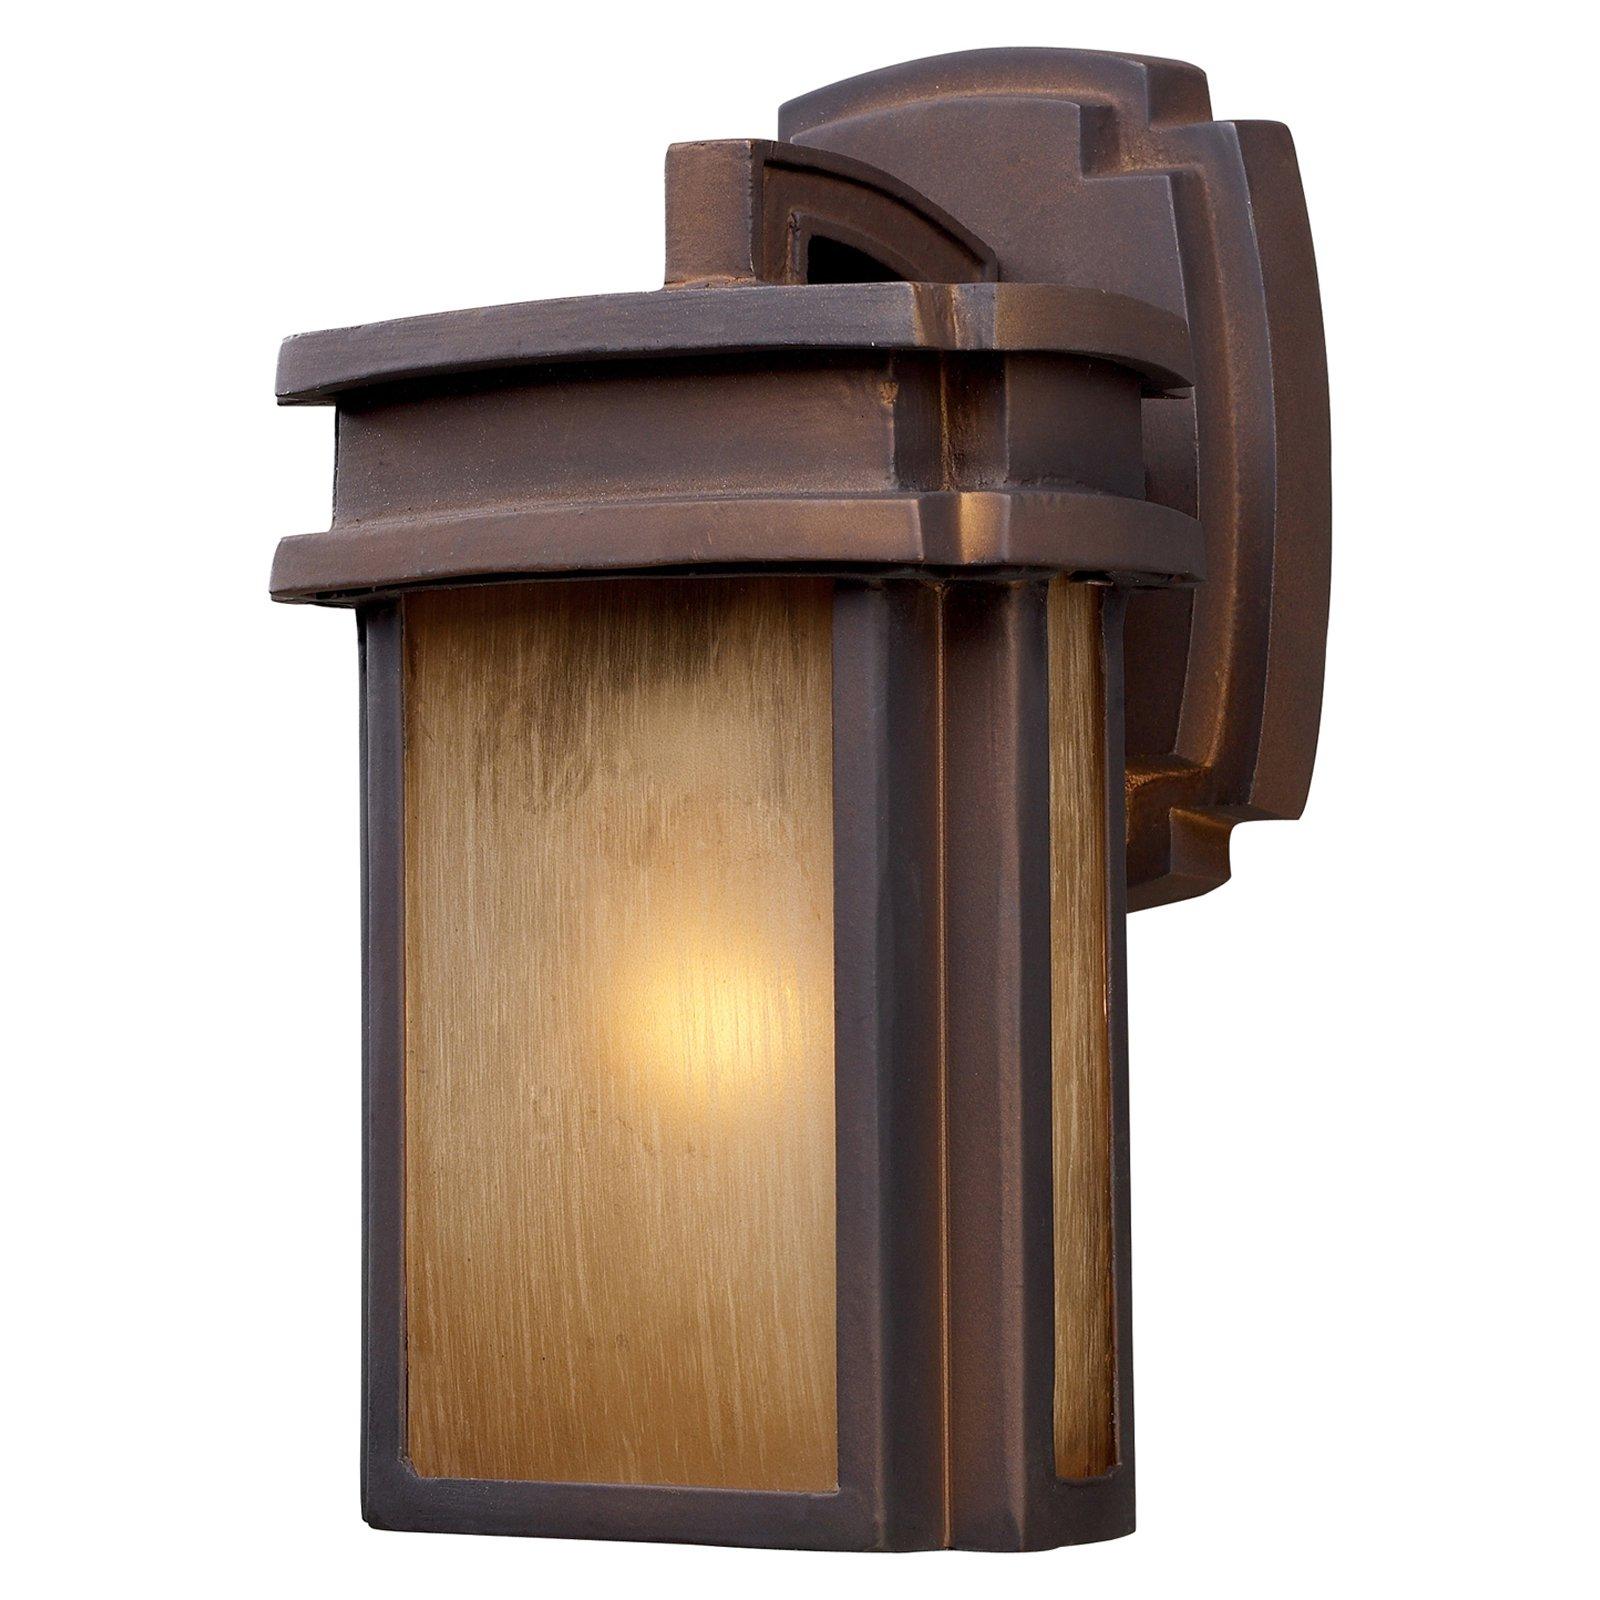 ELK Lighting Sedona 42146/1 1-Light Outdoor Wall Sconce